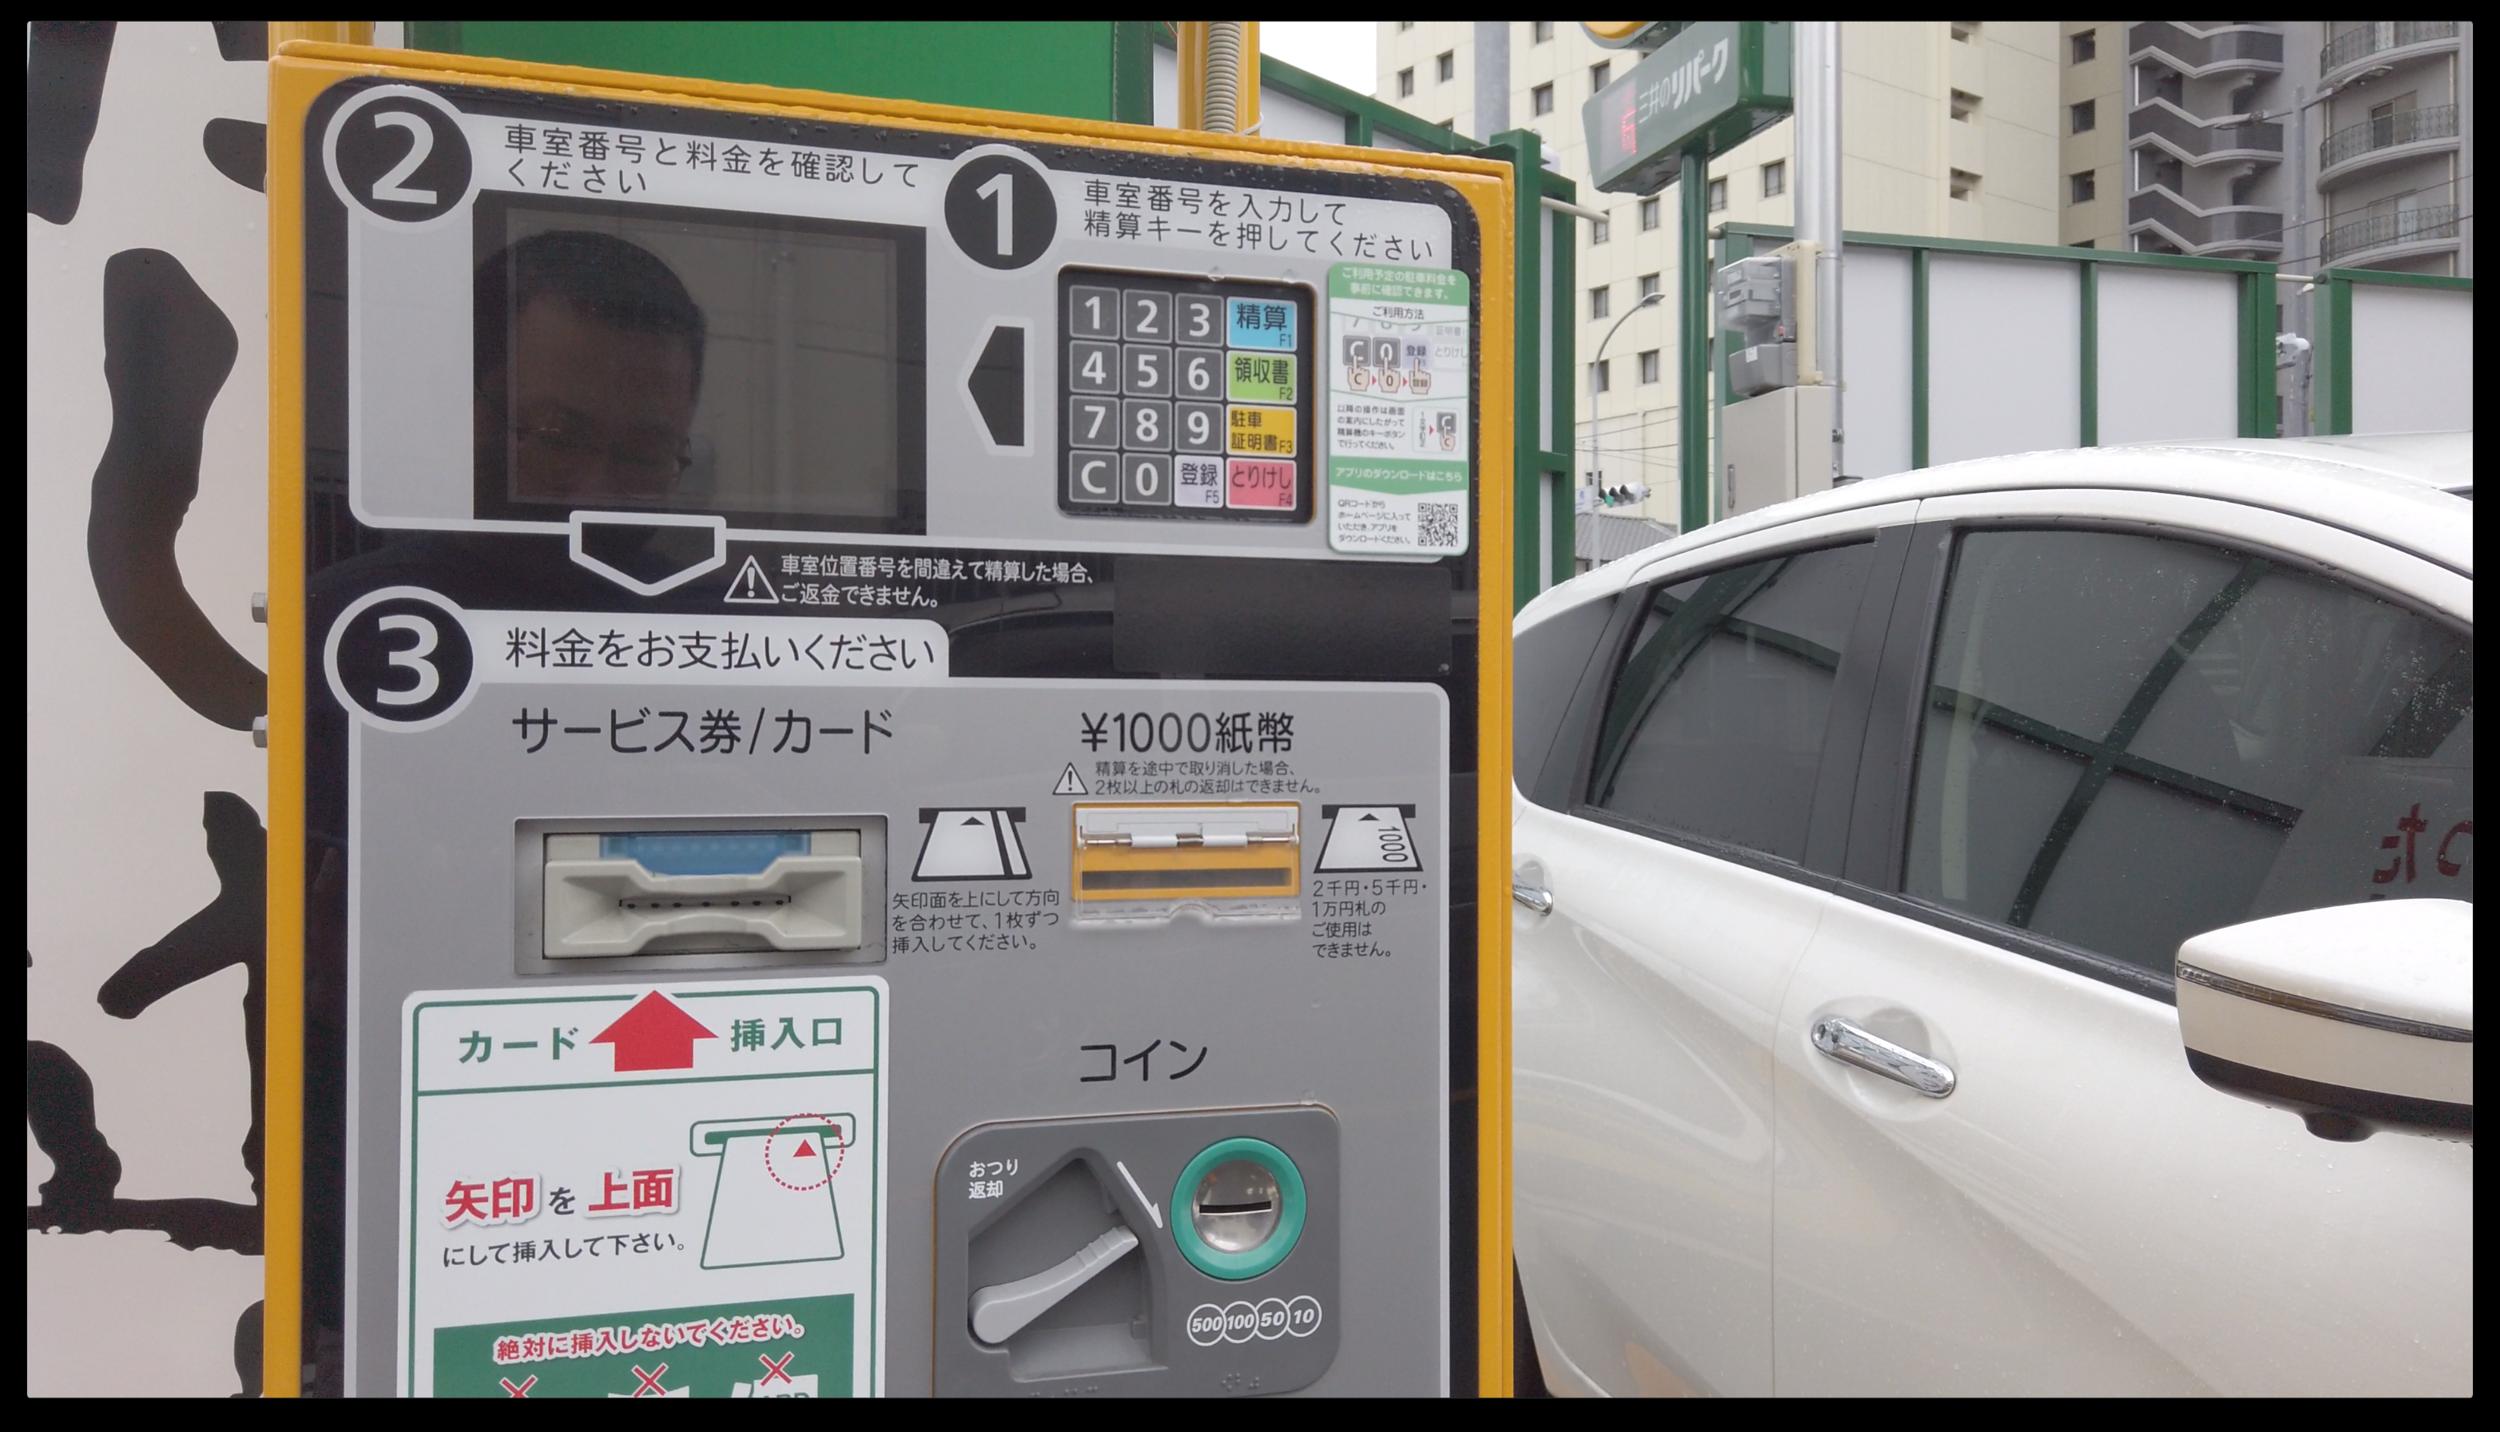 Japanese Car Park Payment Machine